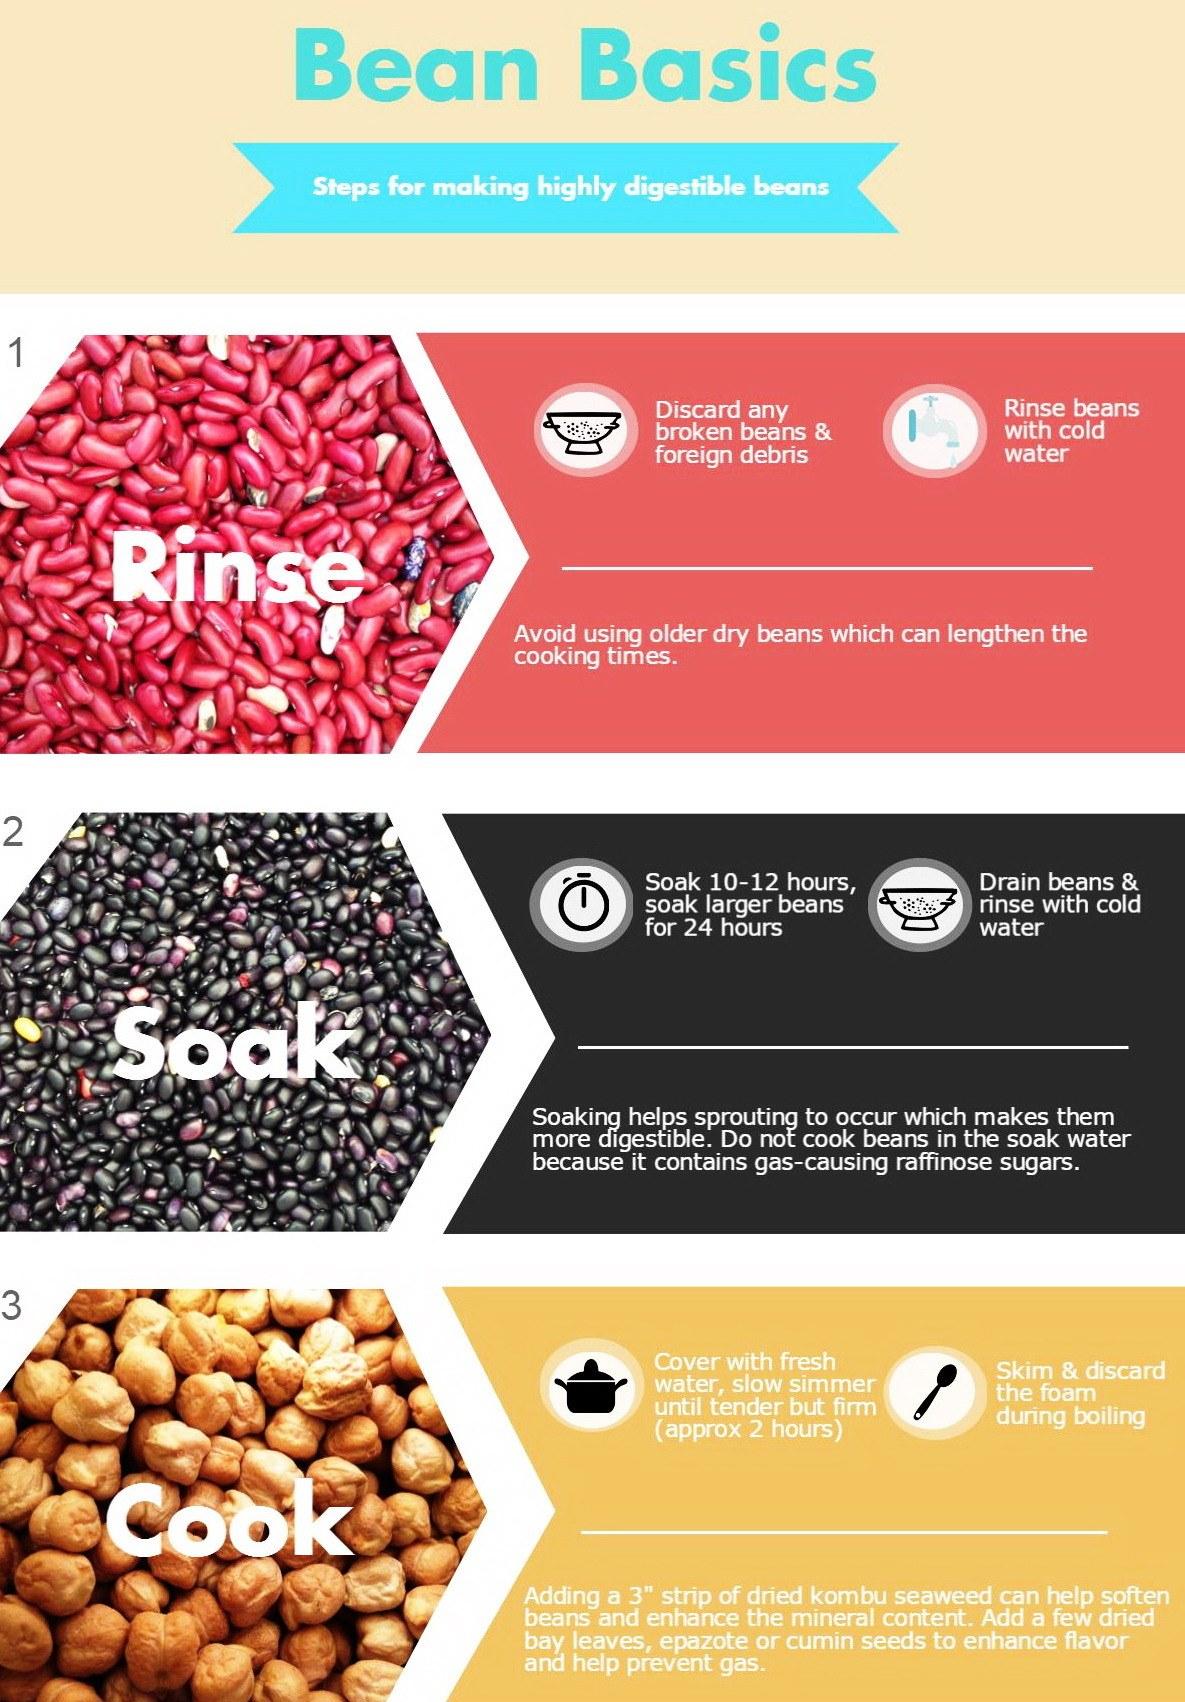 Digestible beans